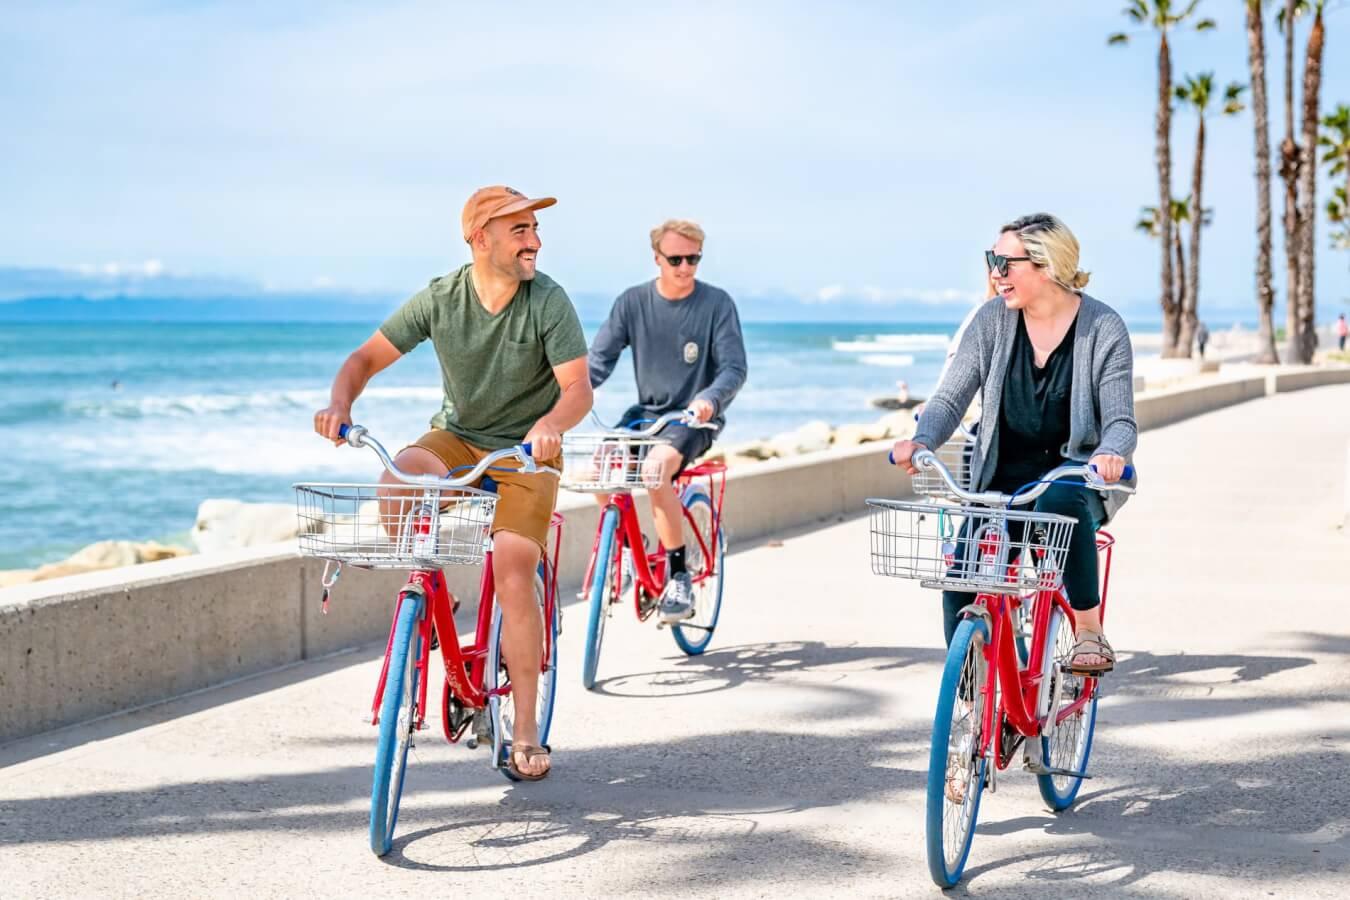 Friends riding bikes at surfers point ventura